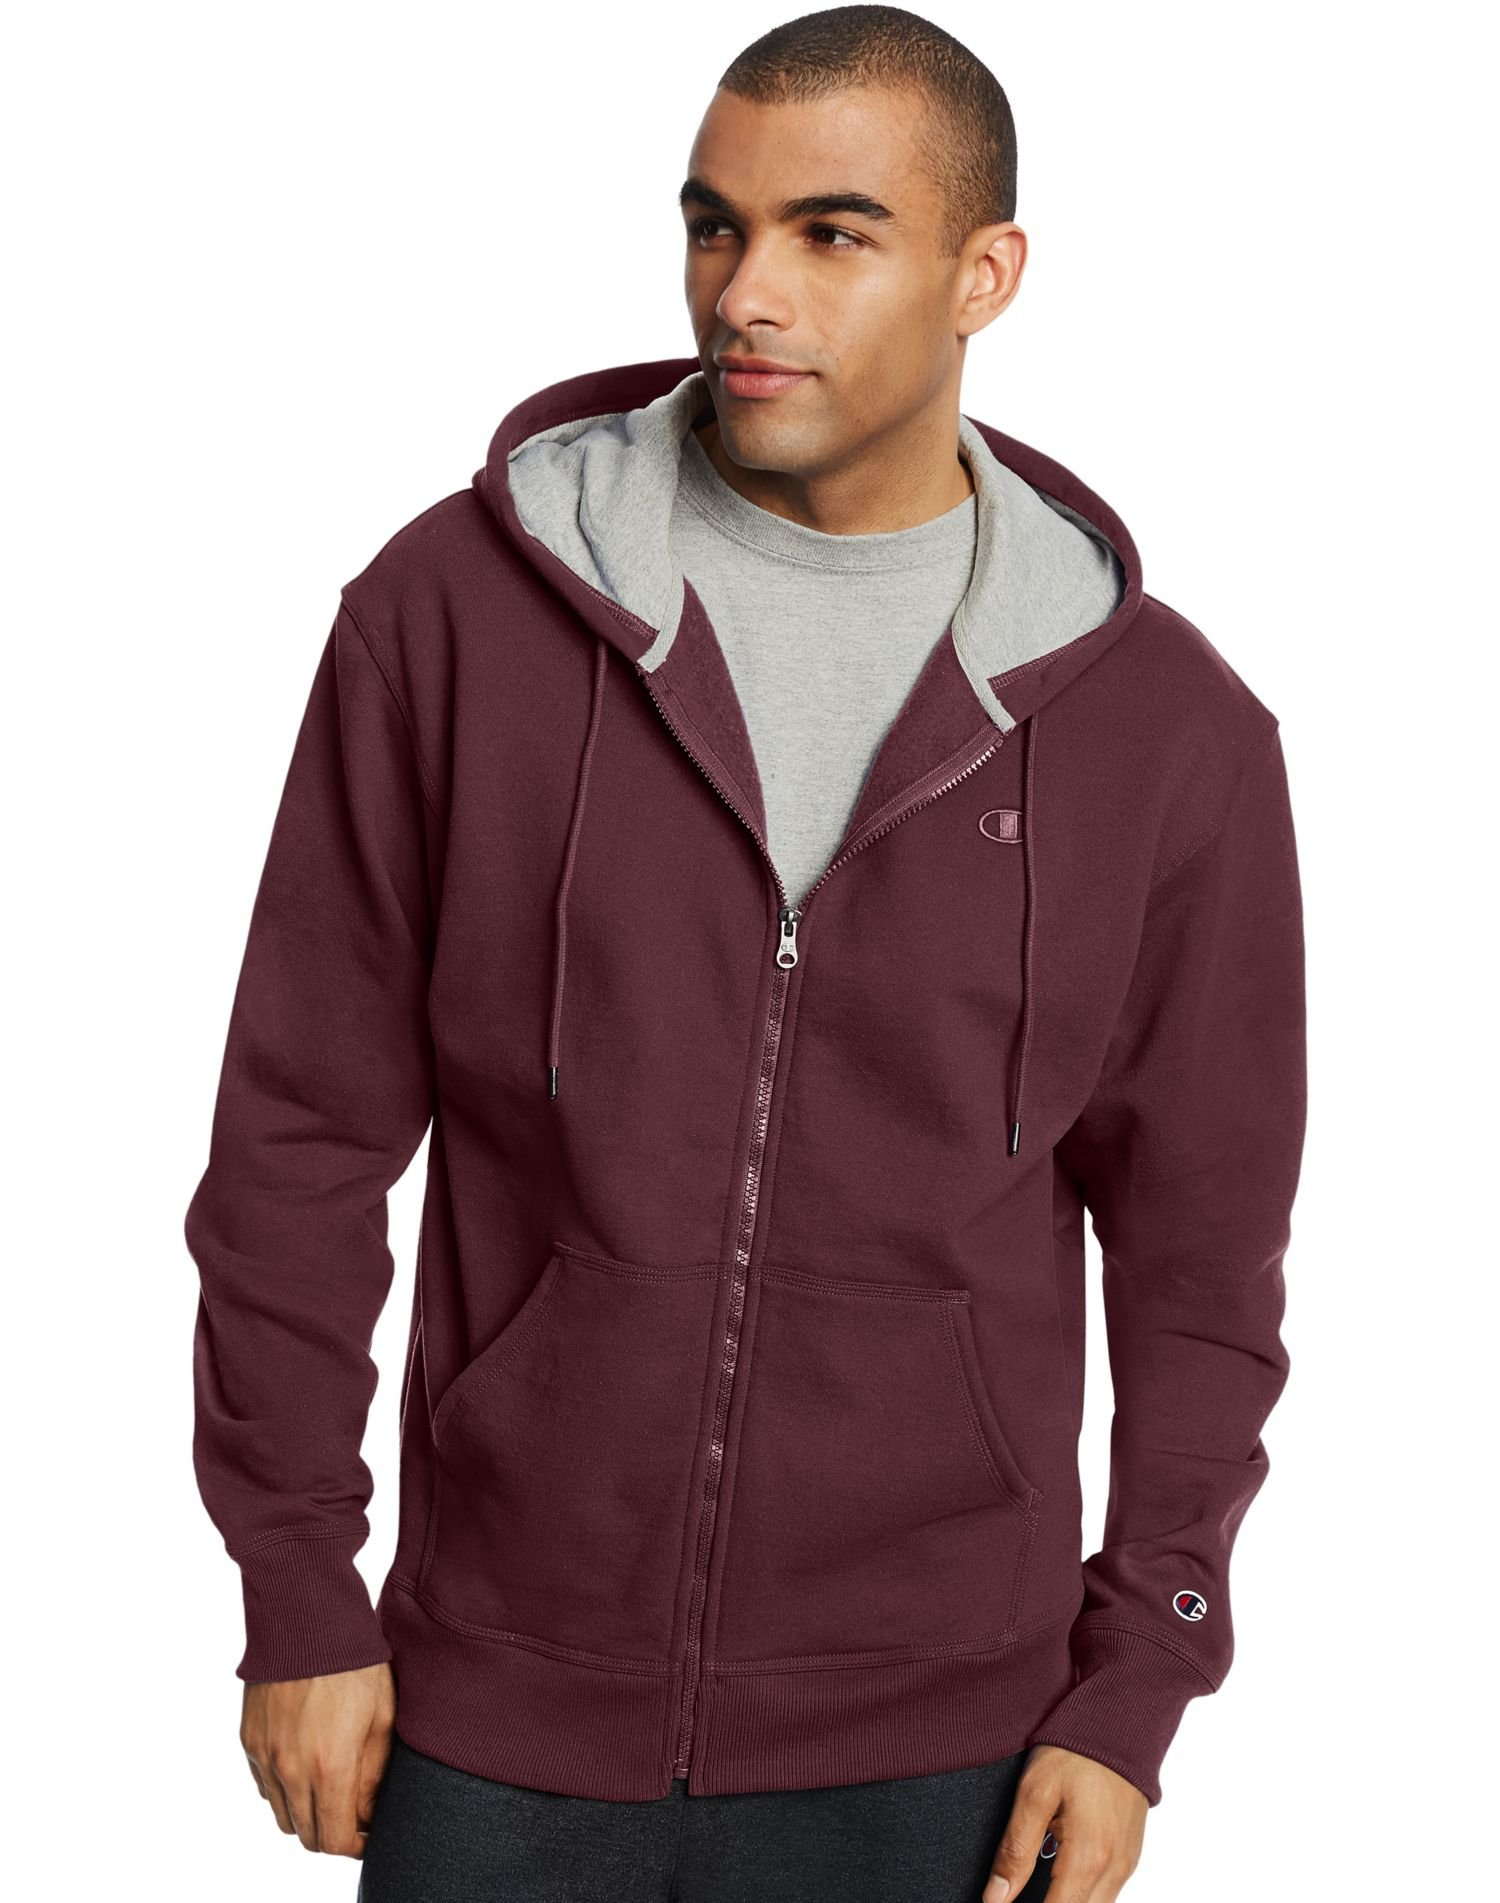 Champion Mens Powerblend Fleece Full Zip Jacket, 3XL, Maroon by Champion